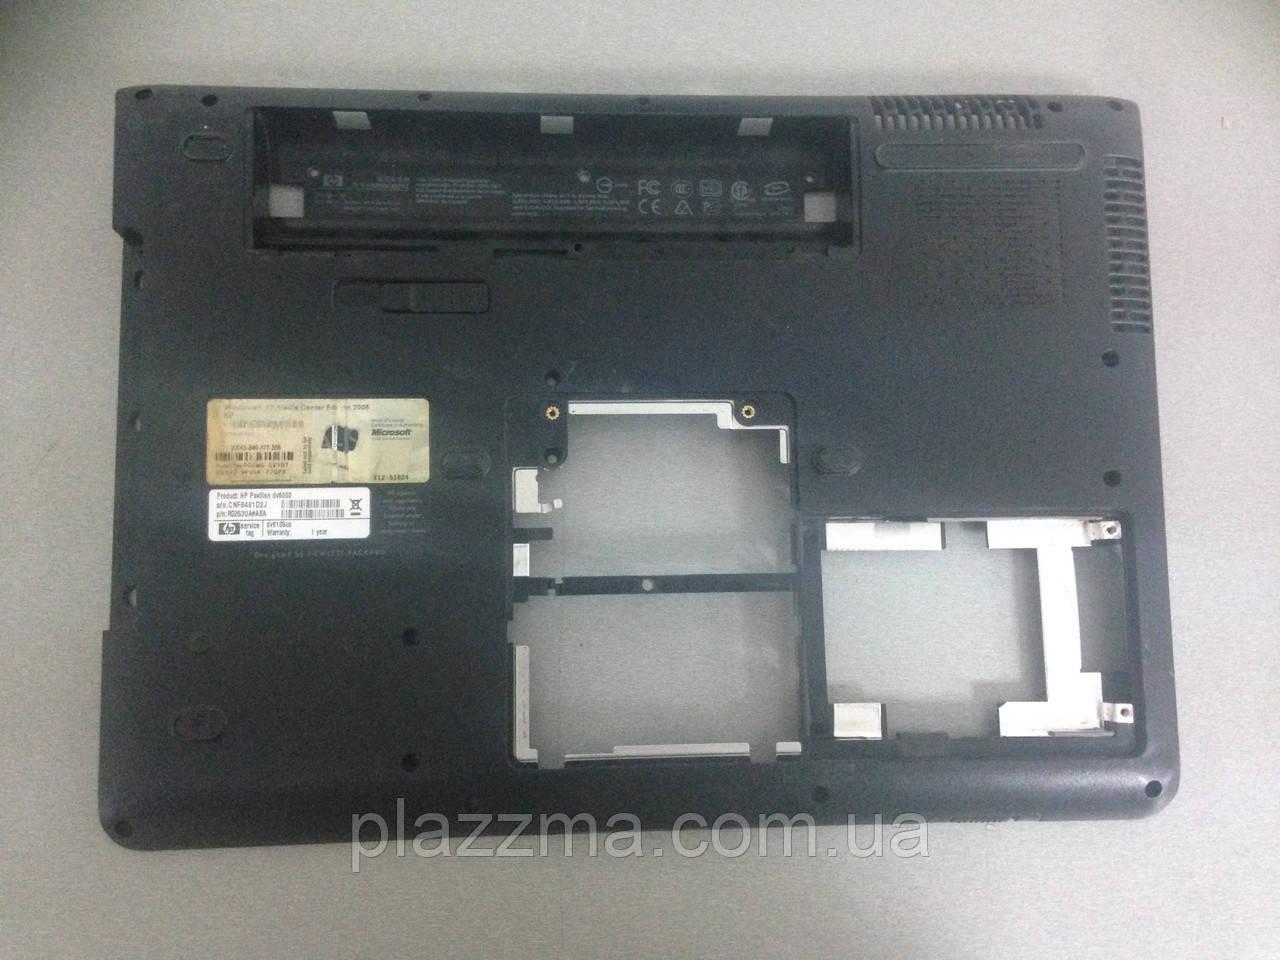 Нижняя часть корпуса HP DV6000(dv6105us) б у б/у